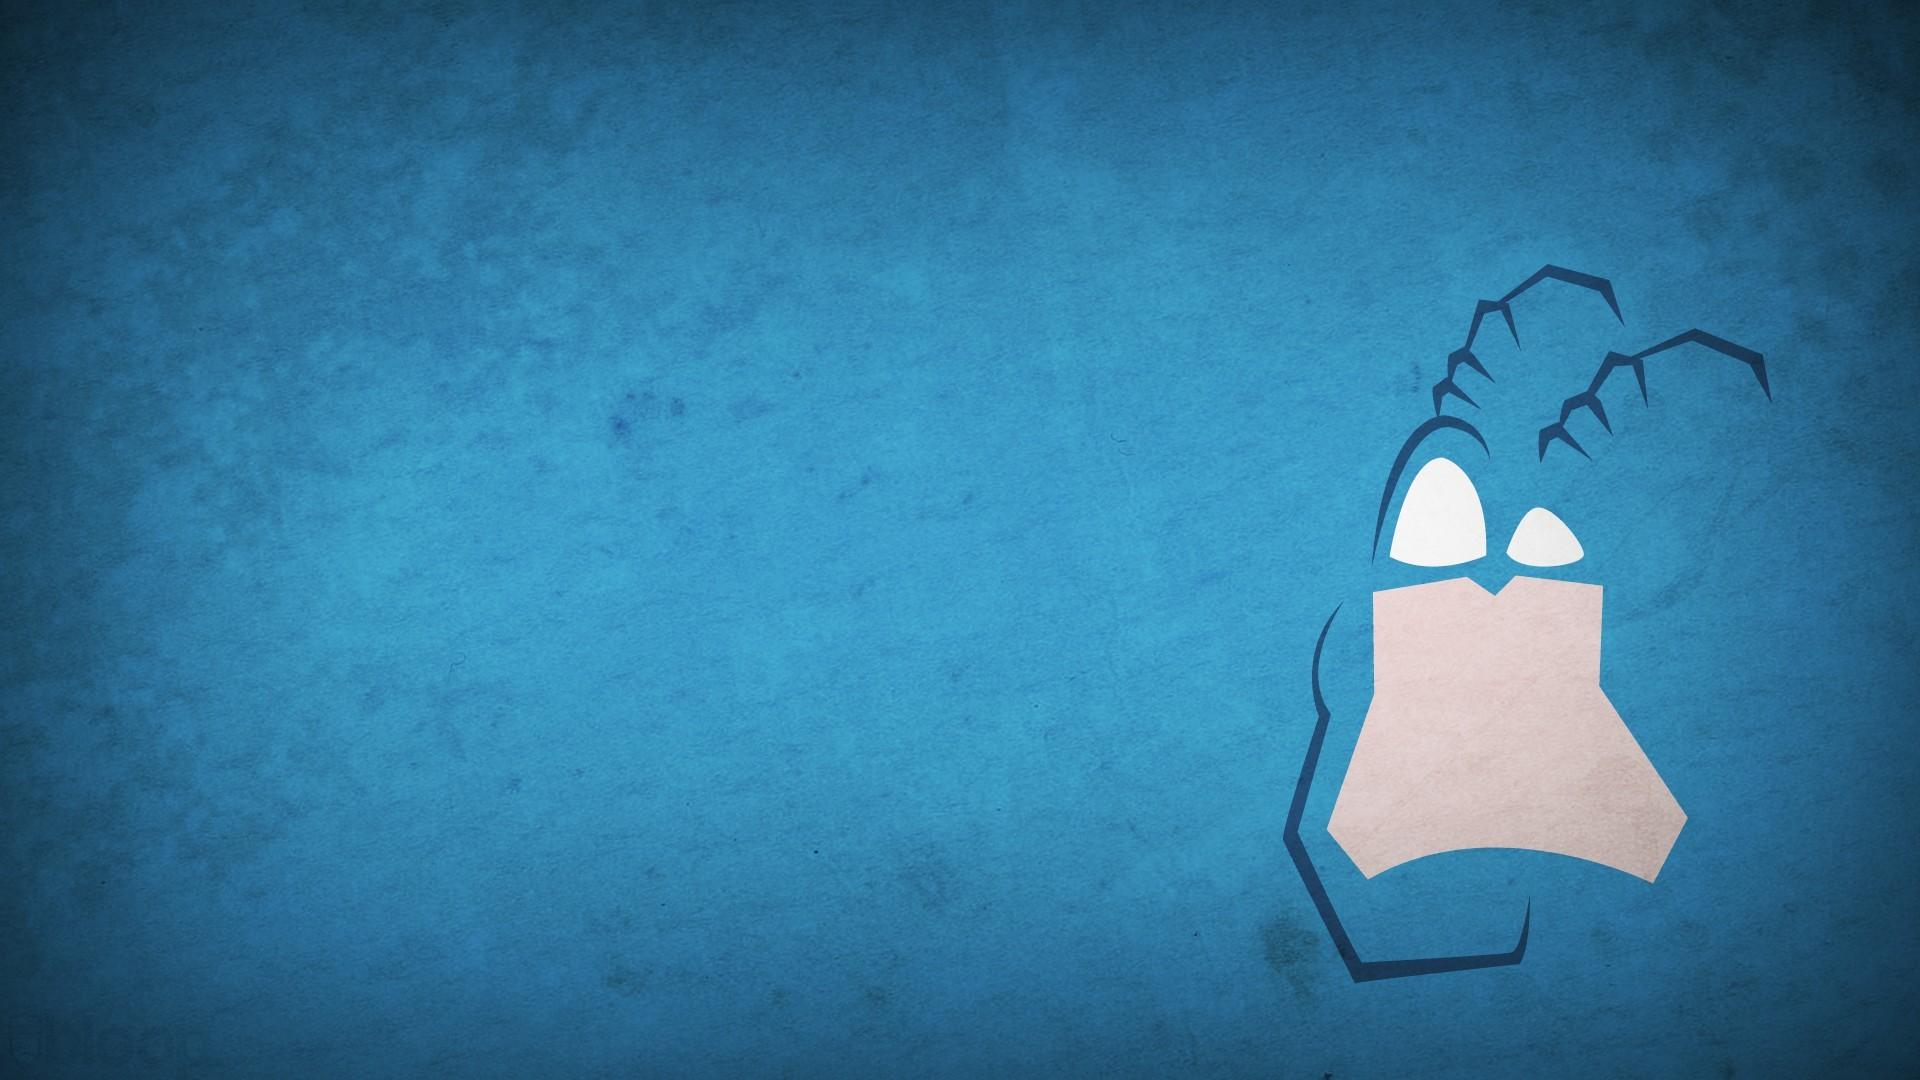 General 1920x1080 minimalism artwork cartoon Blo0p superhero blue background blue